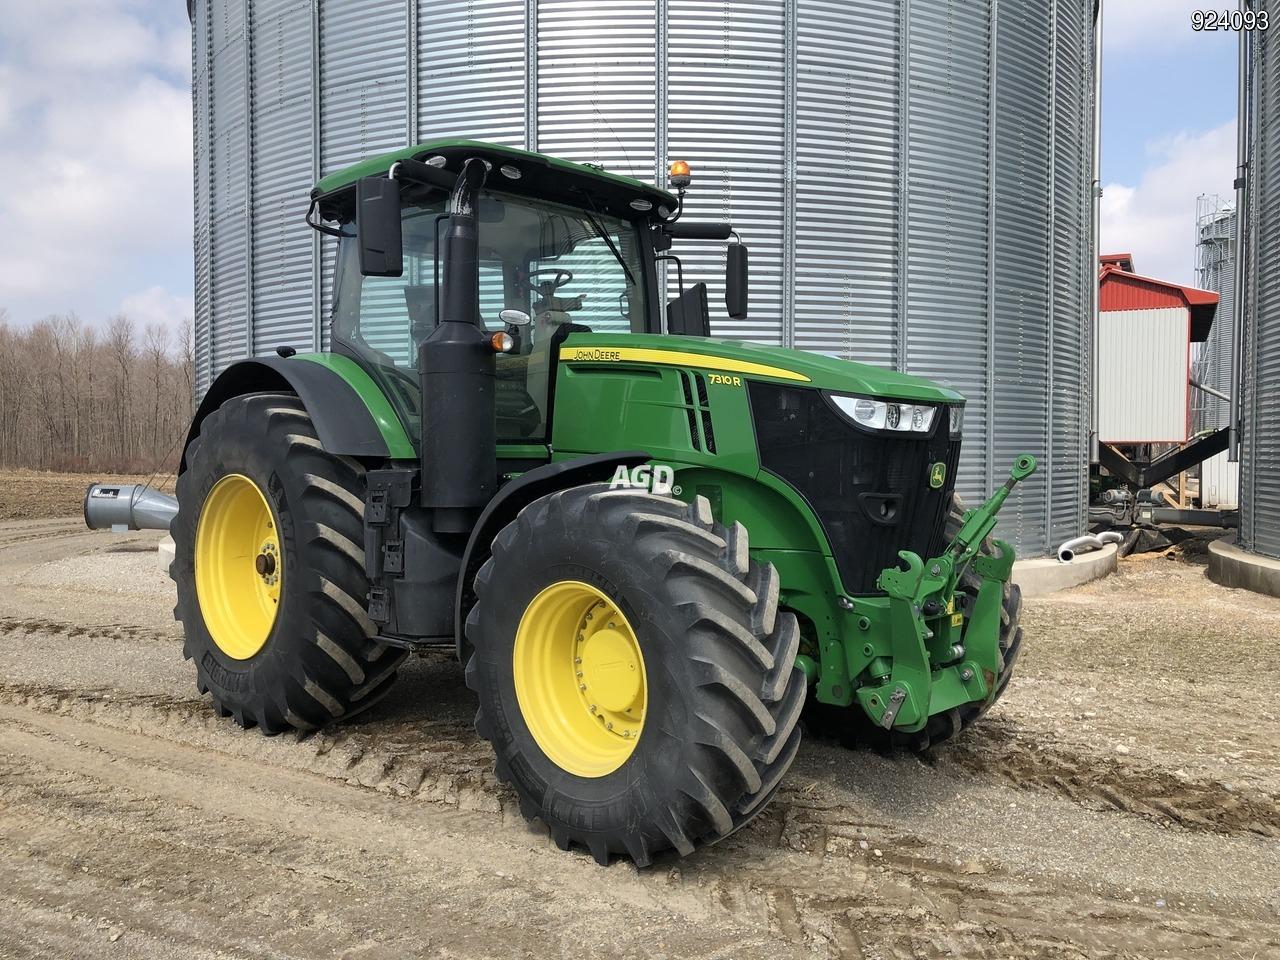 John Deere 7310R Tracteur Vendu!! concernant Image Tracteur John Deere